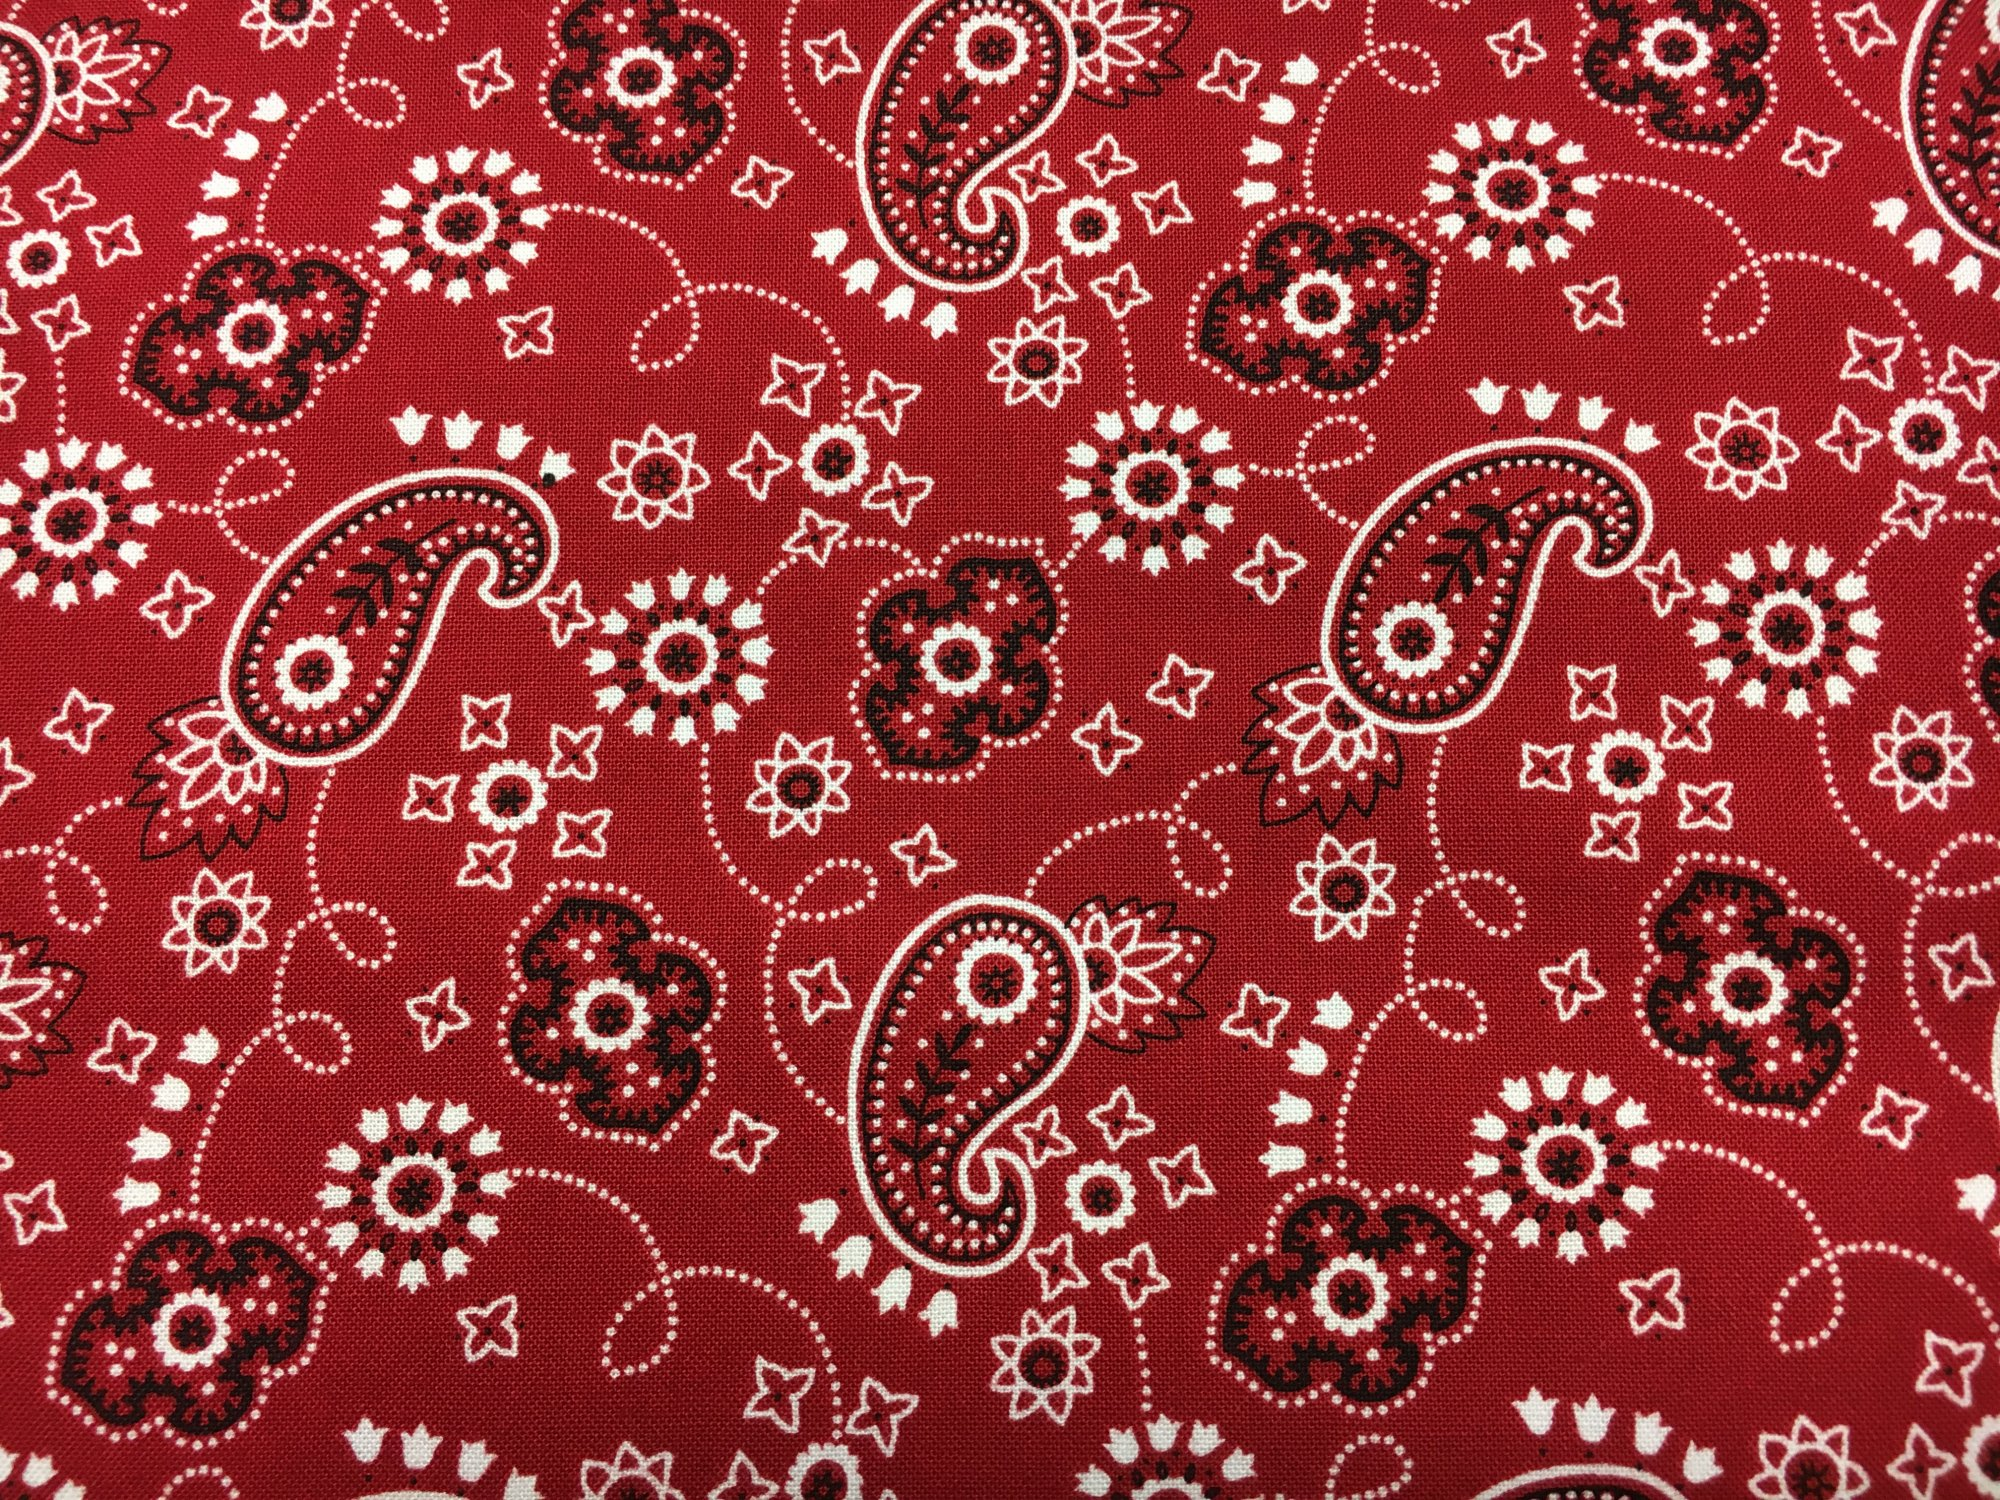 Blank Quilting; Bandanamania/Round Up fabrics